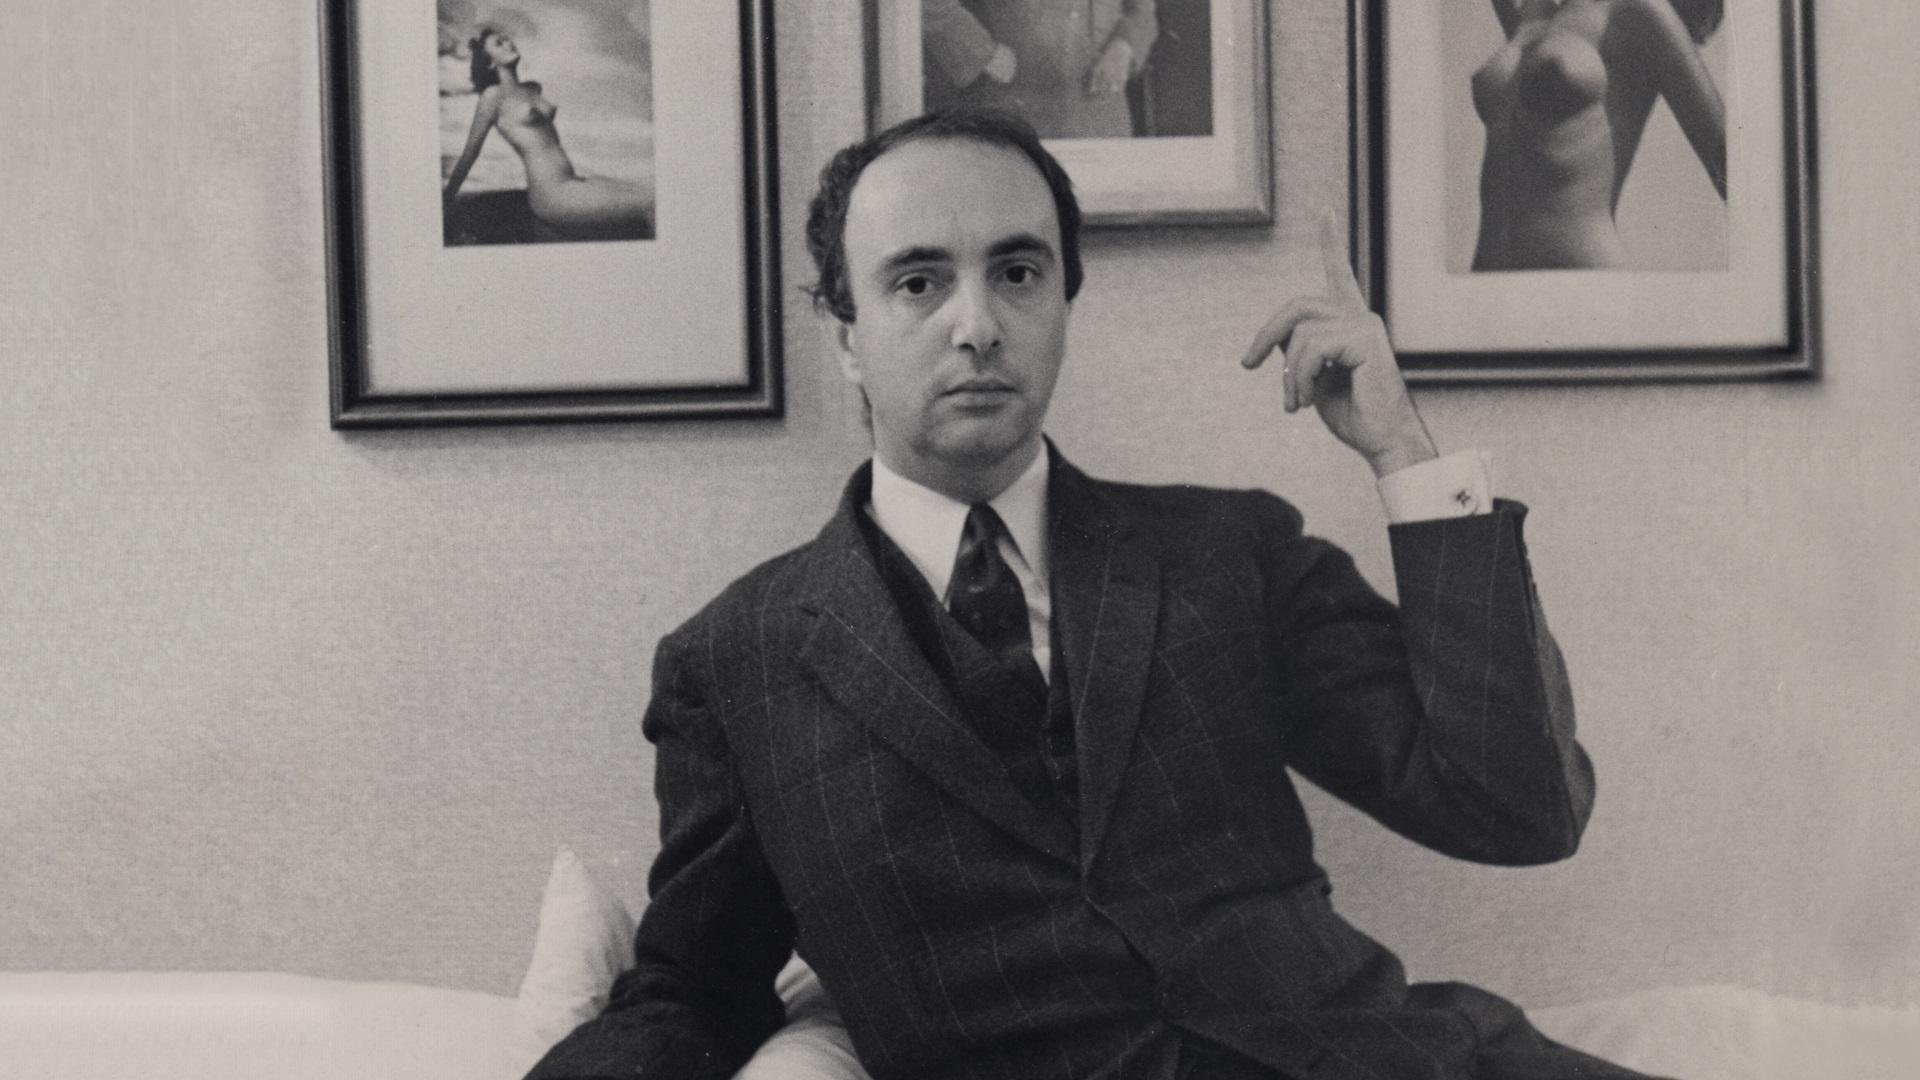 Piero Vivarelli: Life As a B-Movie: su Sky Arte la storia di un pioniere del cinema